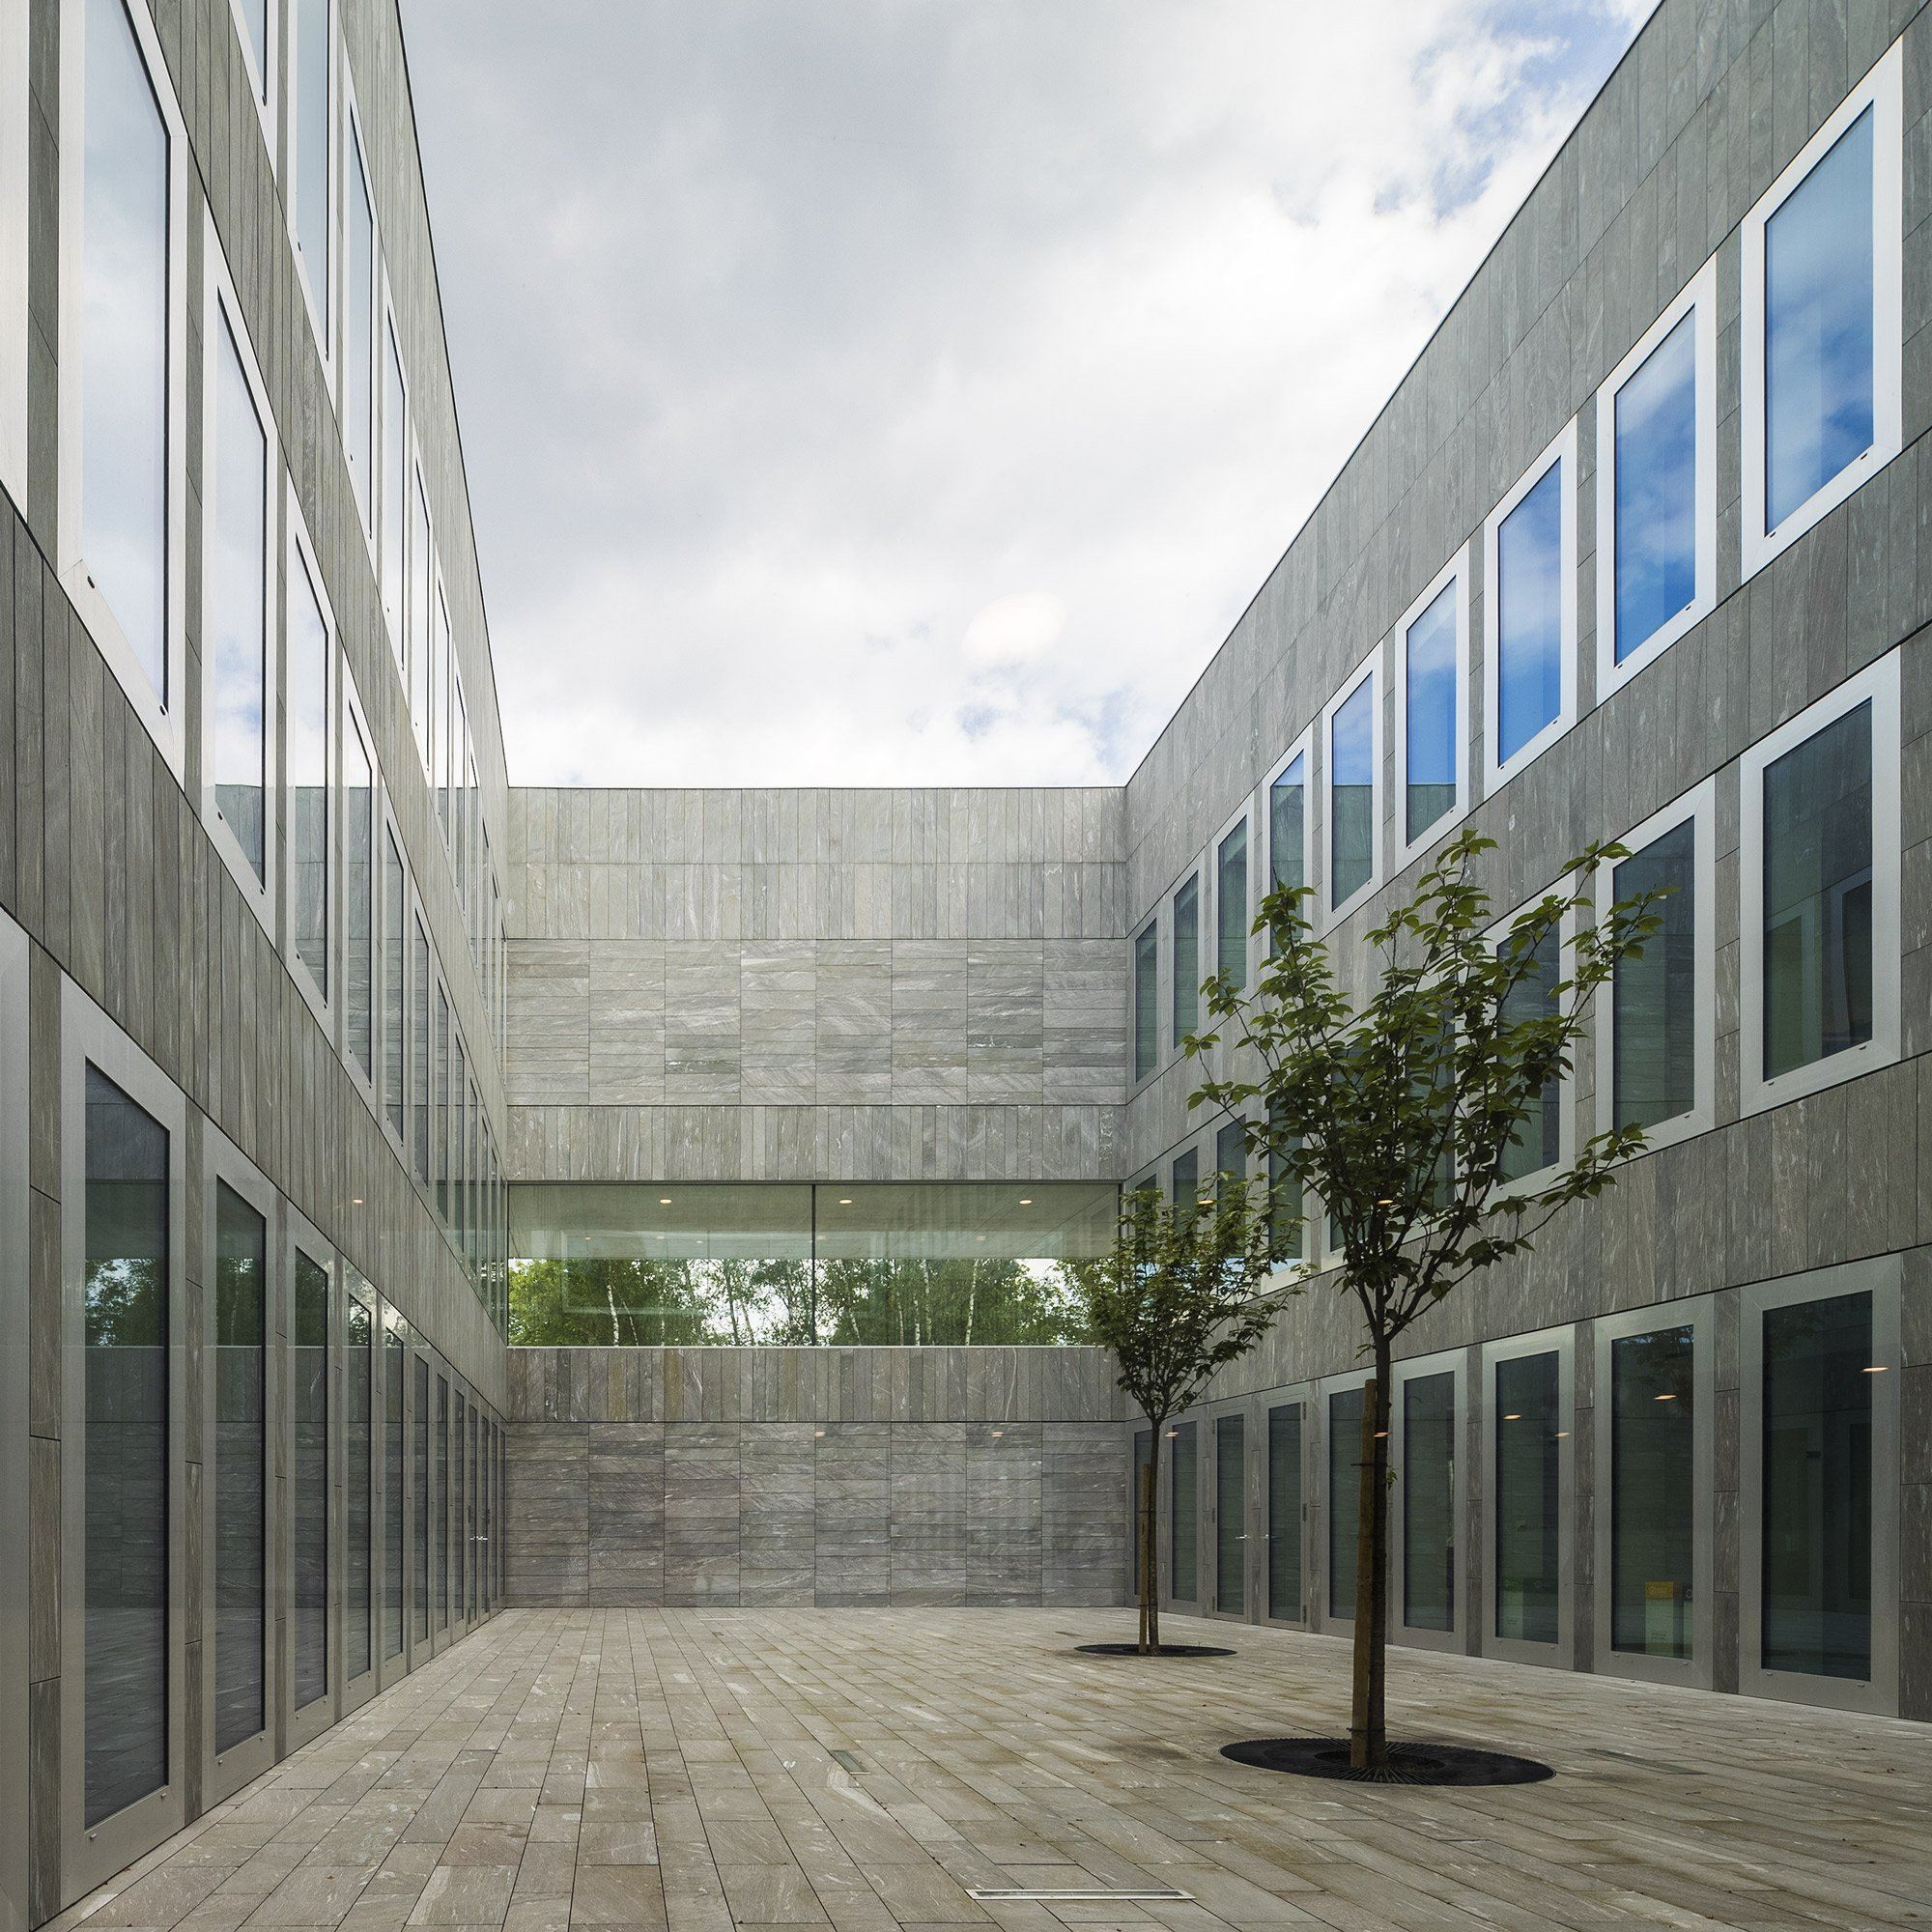 Camera di Commercio e Artigianato della regione Hauts-De-France, KAAN Architecten e PDAA ©Fernando Guerra FG+SG, courtesy Kaan Architecten and PDAA